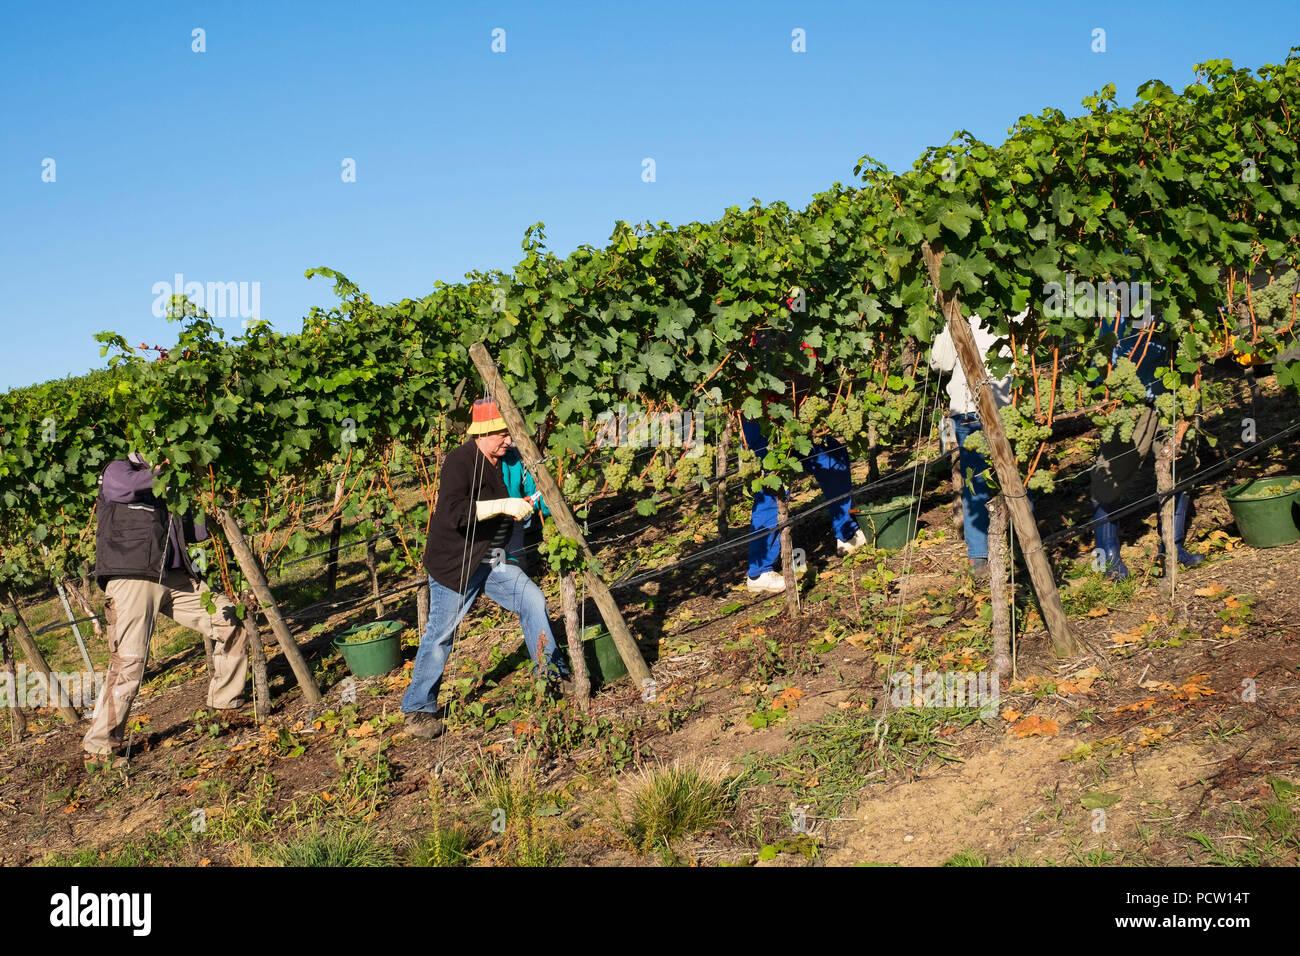 Vintage of Scheurebe, vineyard estate Reinhold Sauer in Escherndorf, municipality of Volkach, Main Franconia, Lower Franconia, Franconia, Bavaria, Germany - Stock Image